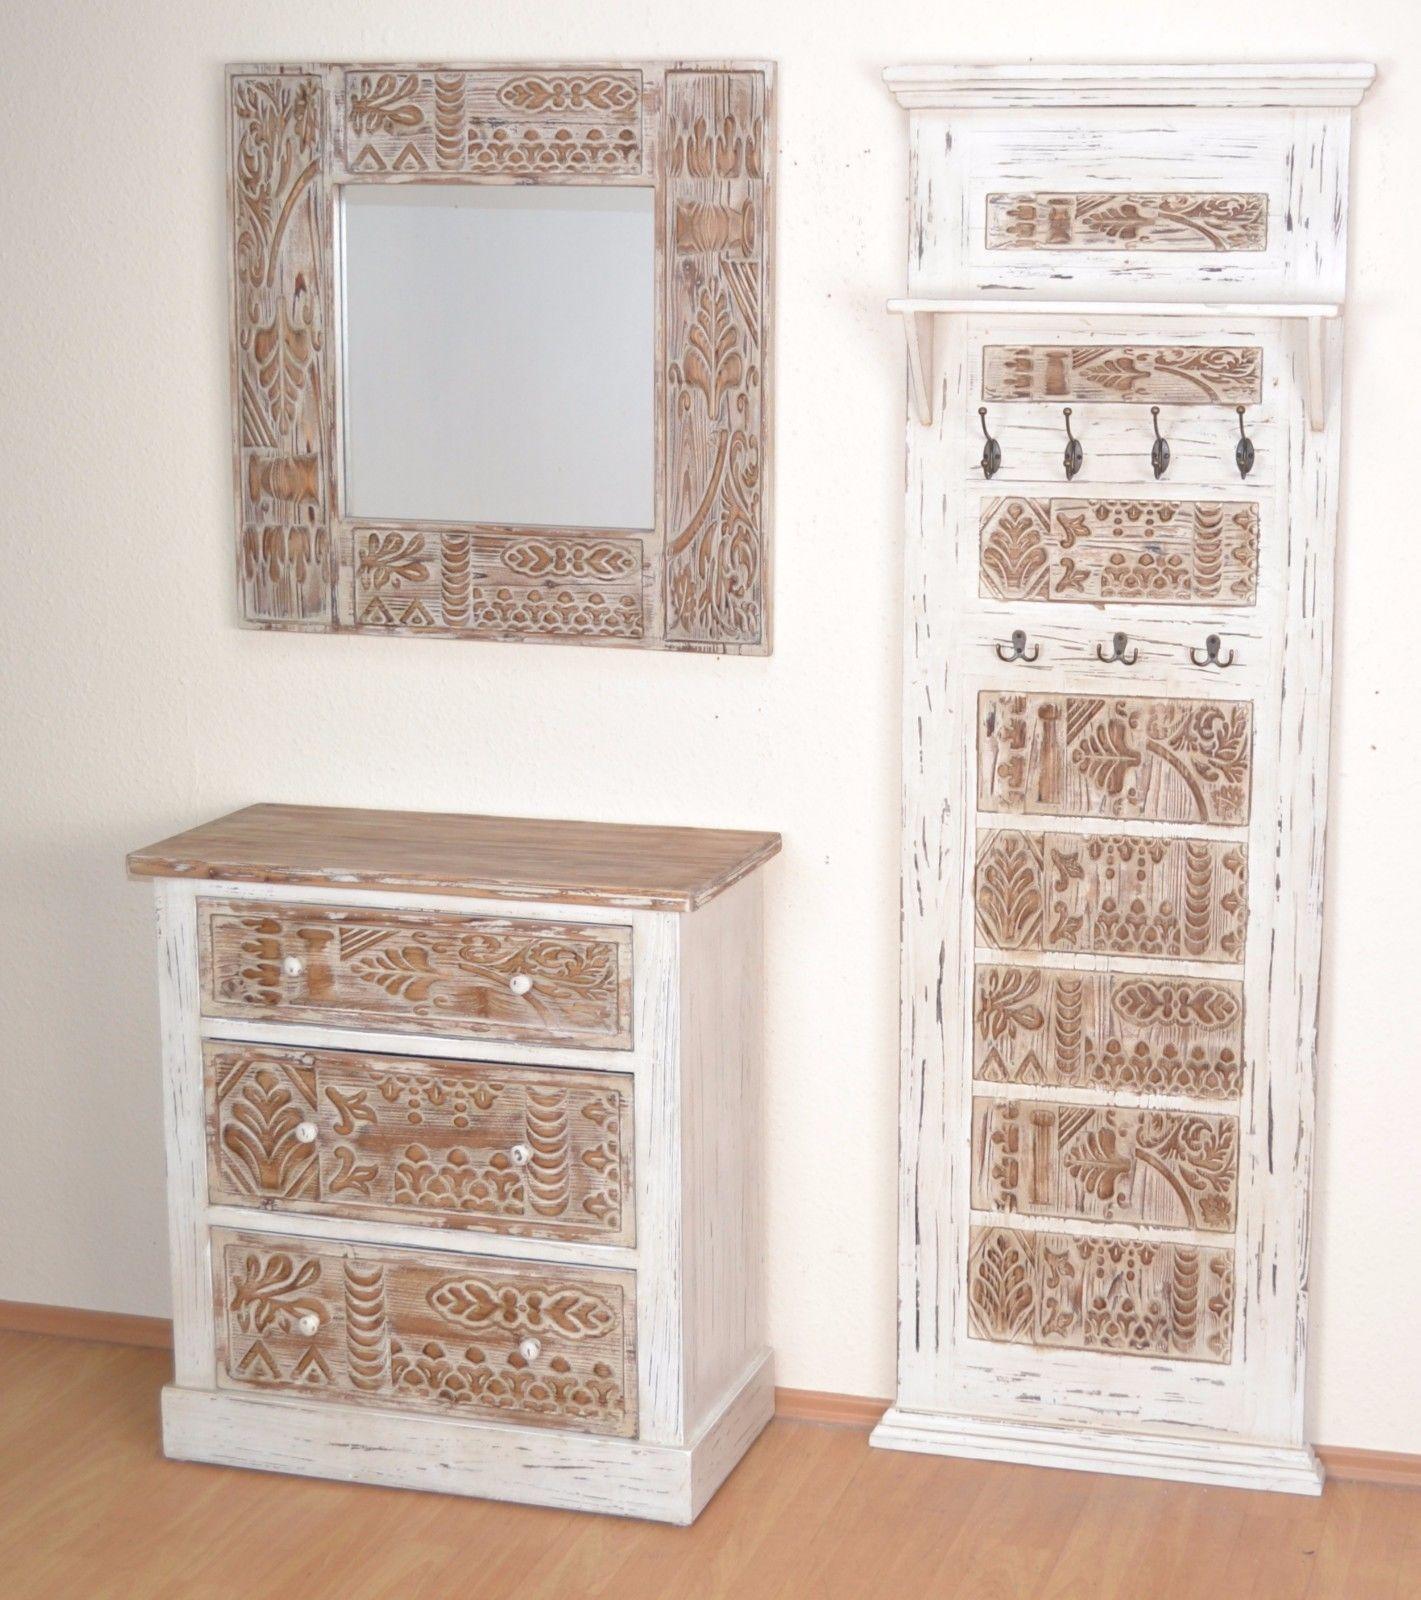 garderobenpaneele massivholz naturbraun wandgarderobe flur vintage used look kaufen bei go perfect. Black Bedroom Furniture Sets. Home Design Ideas